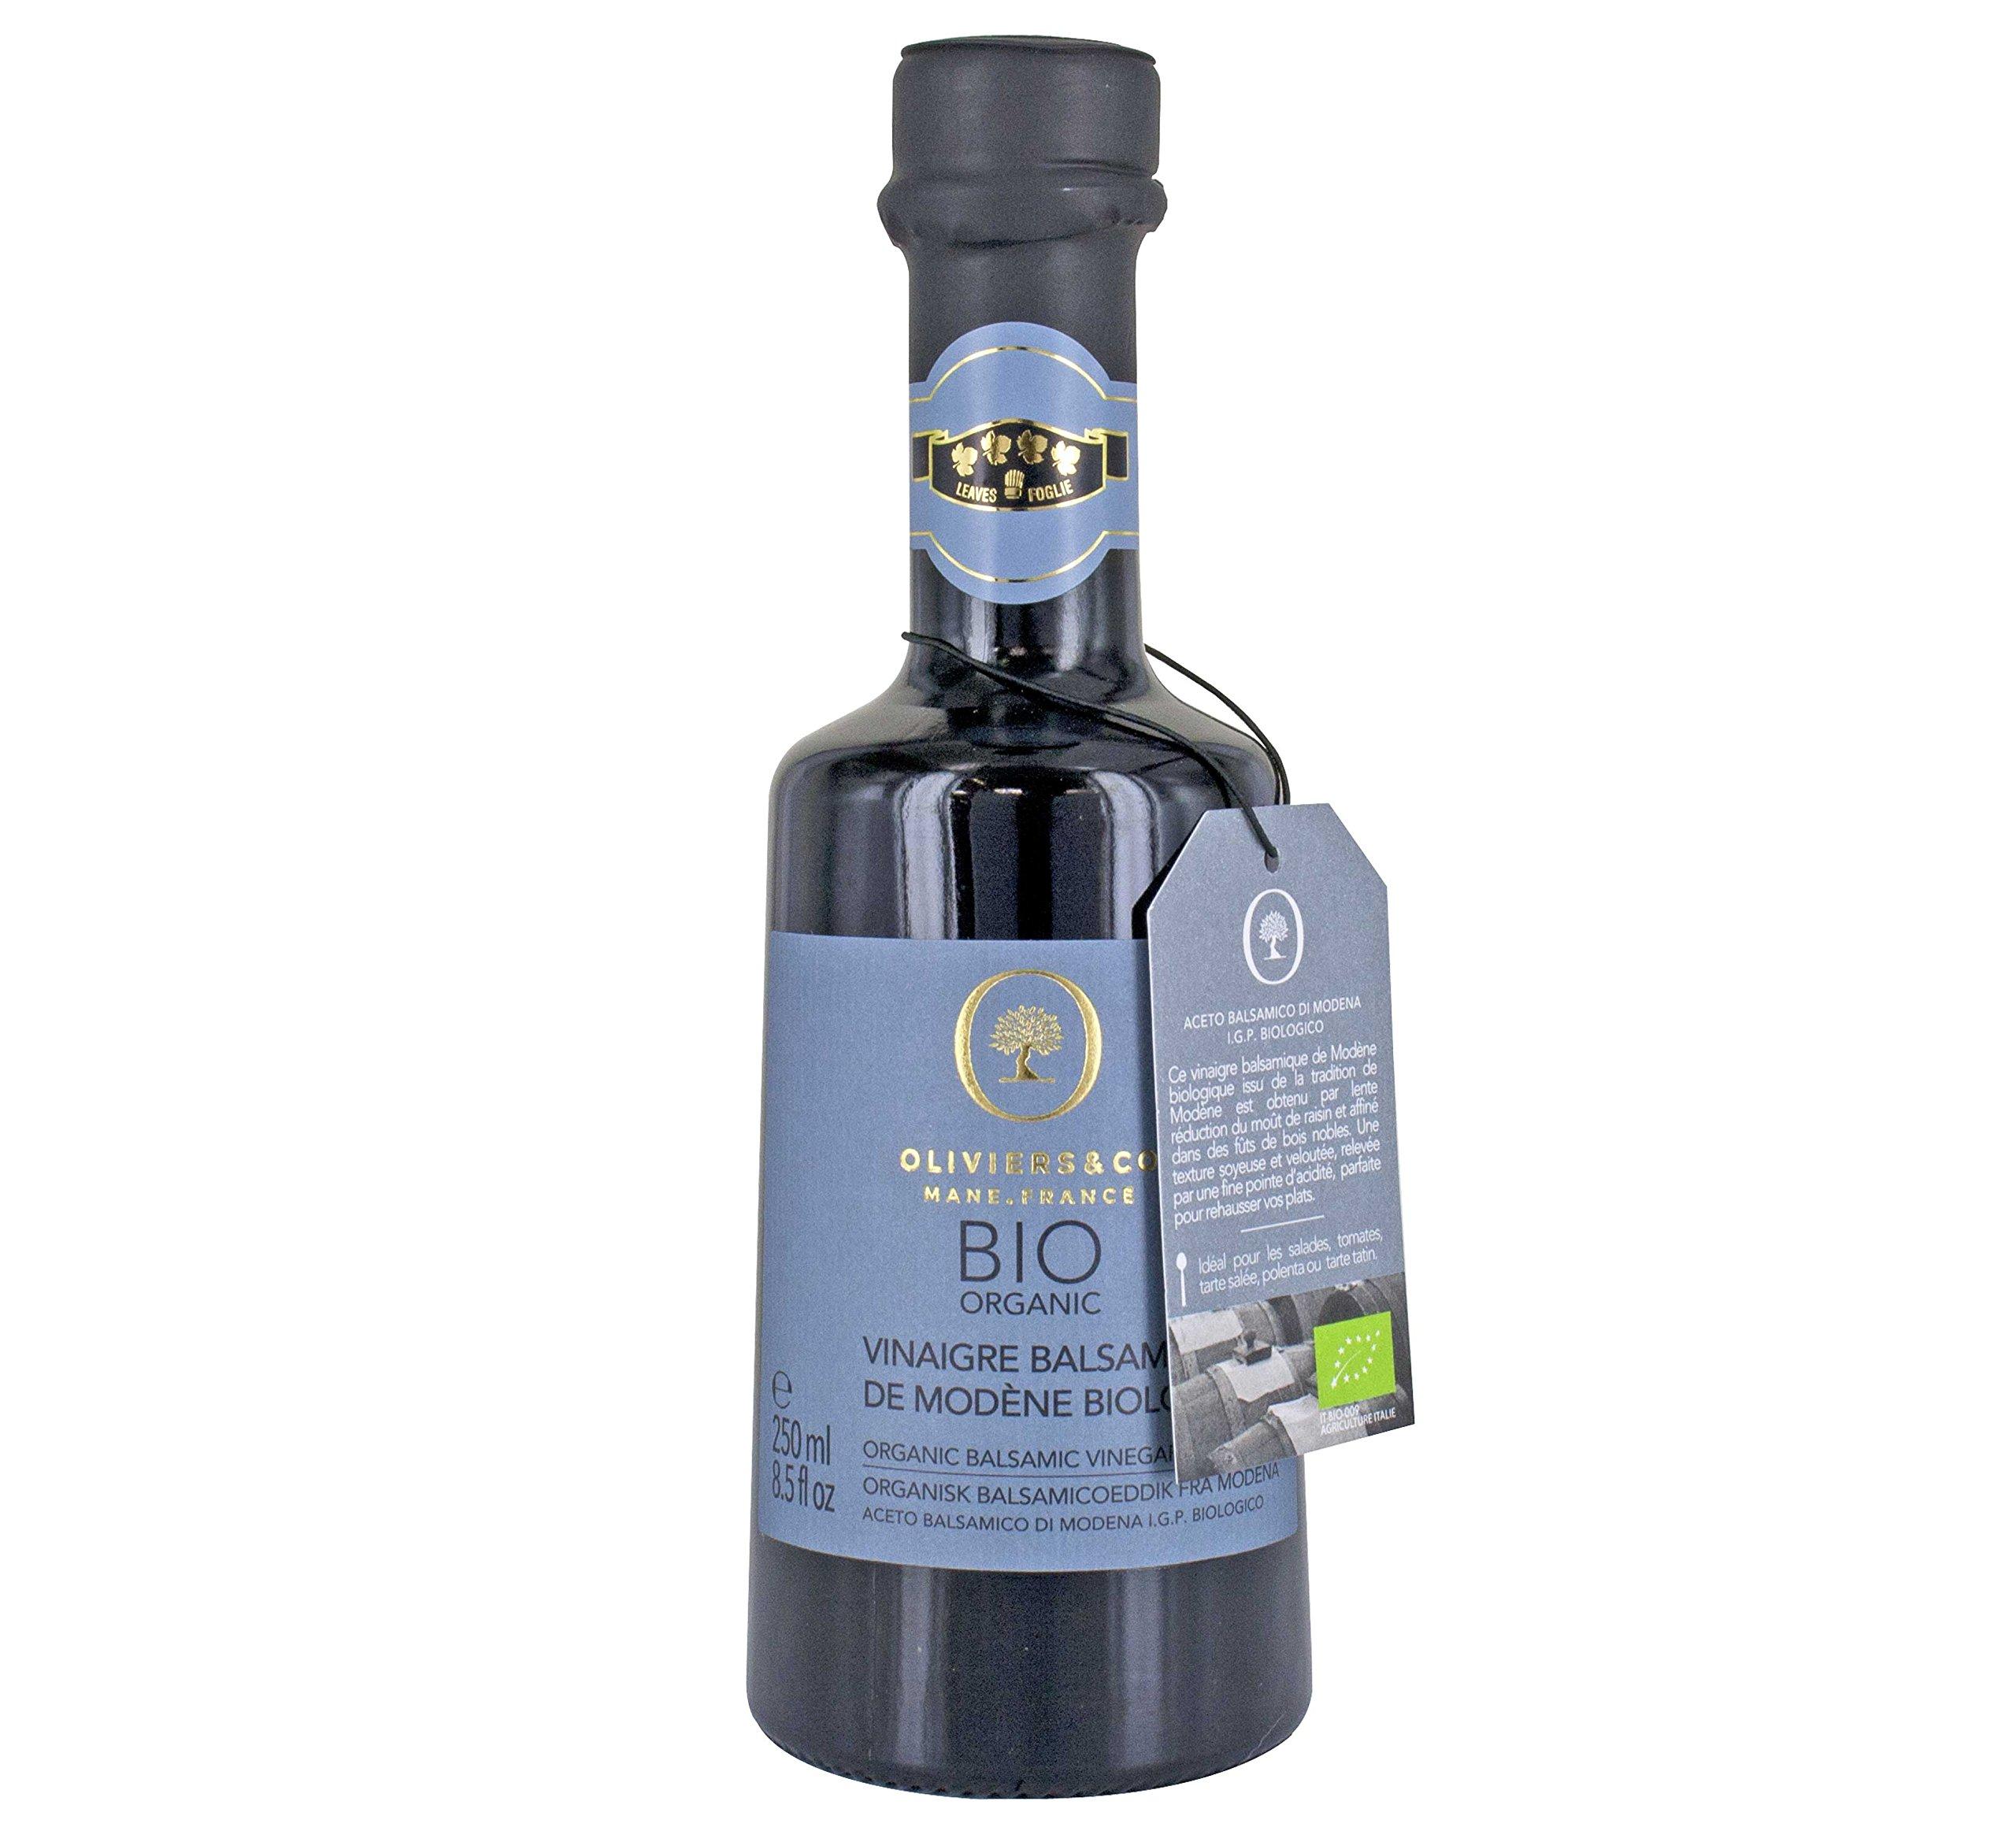 Oliviers & Co Balsamic Vinegar of Modena (Organic)